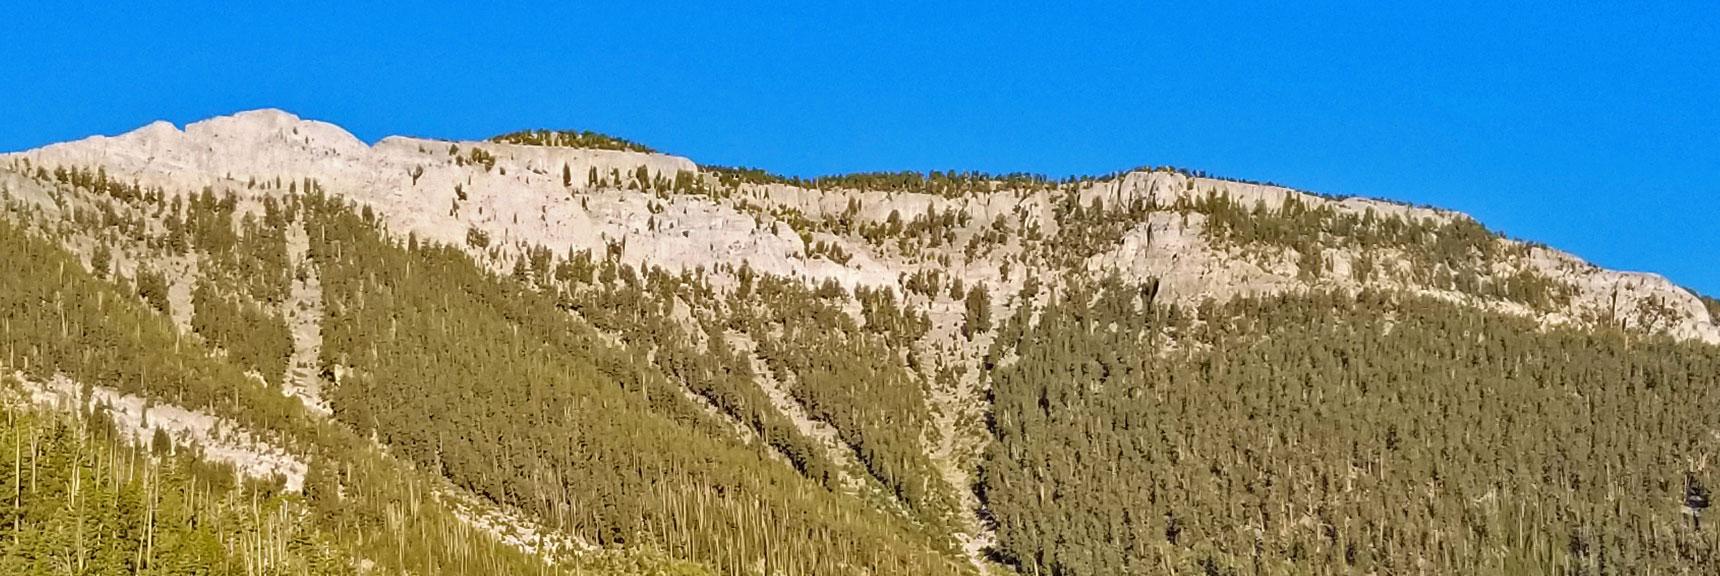 Mummy Mountain's East Side Approaches Enlarged   Mummy Mountain NNE, Mt. Charleston Wilderness, Nevada, Slide 002